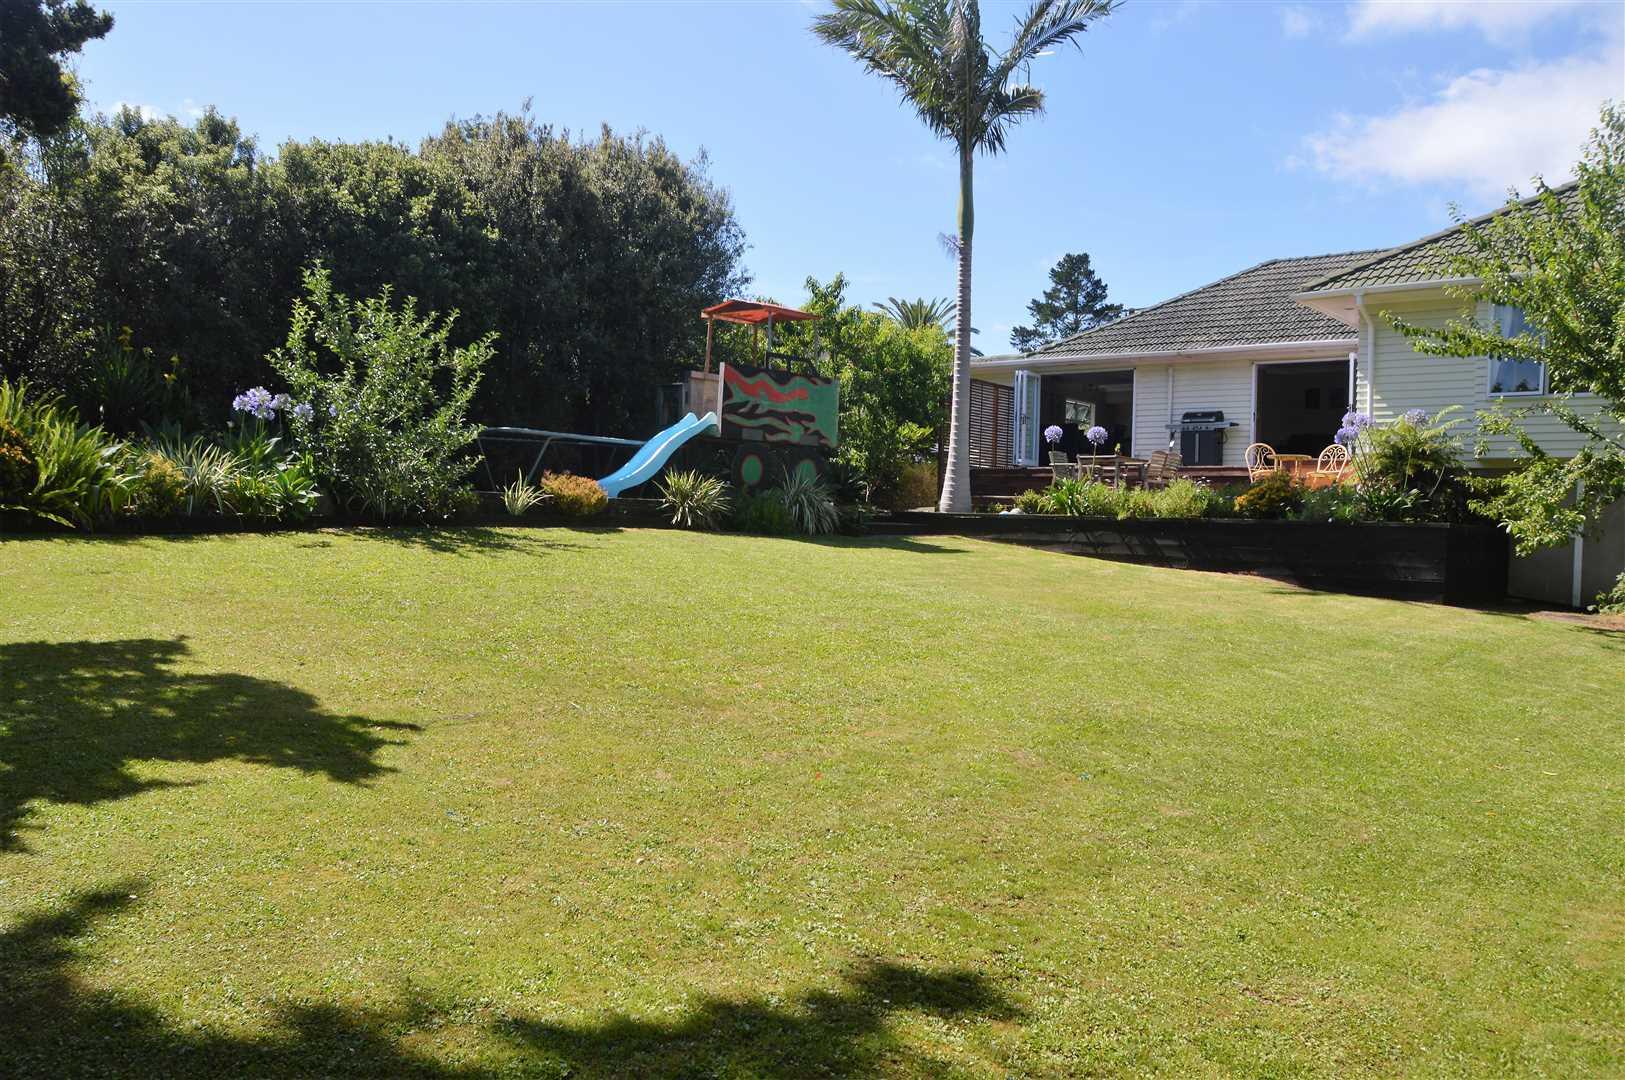 Fabulous Home on Kiwi 1/4 Acre